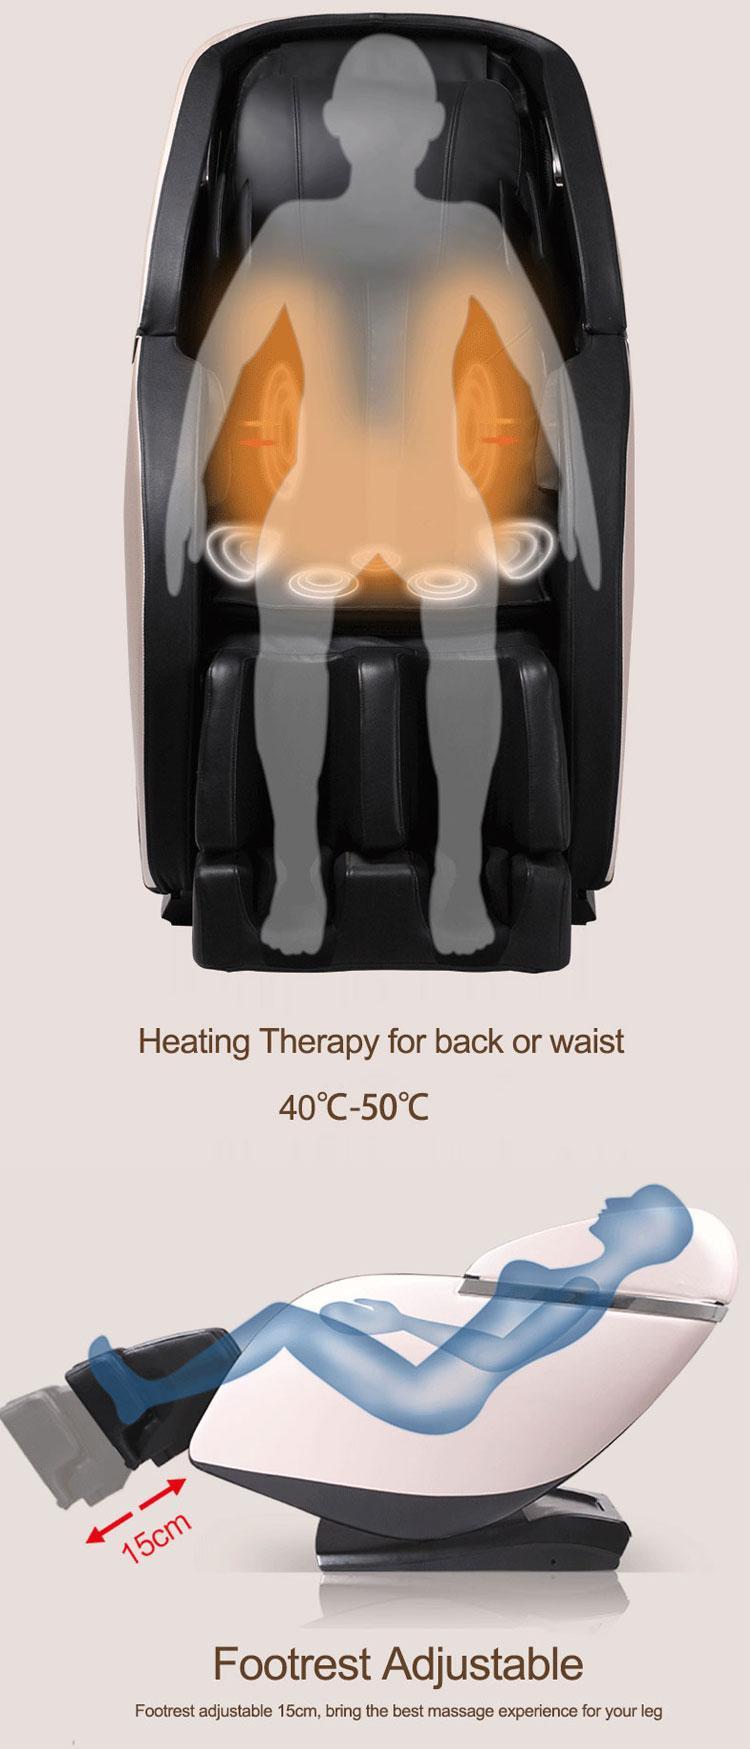 Luxury SL Track Kneading Ball Massage Chair Price  10